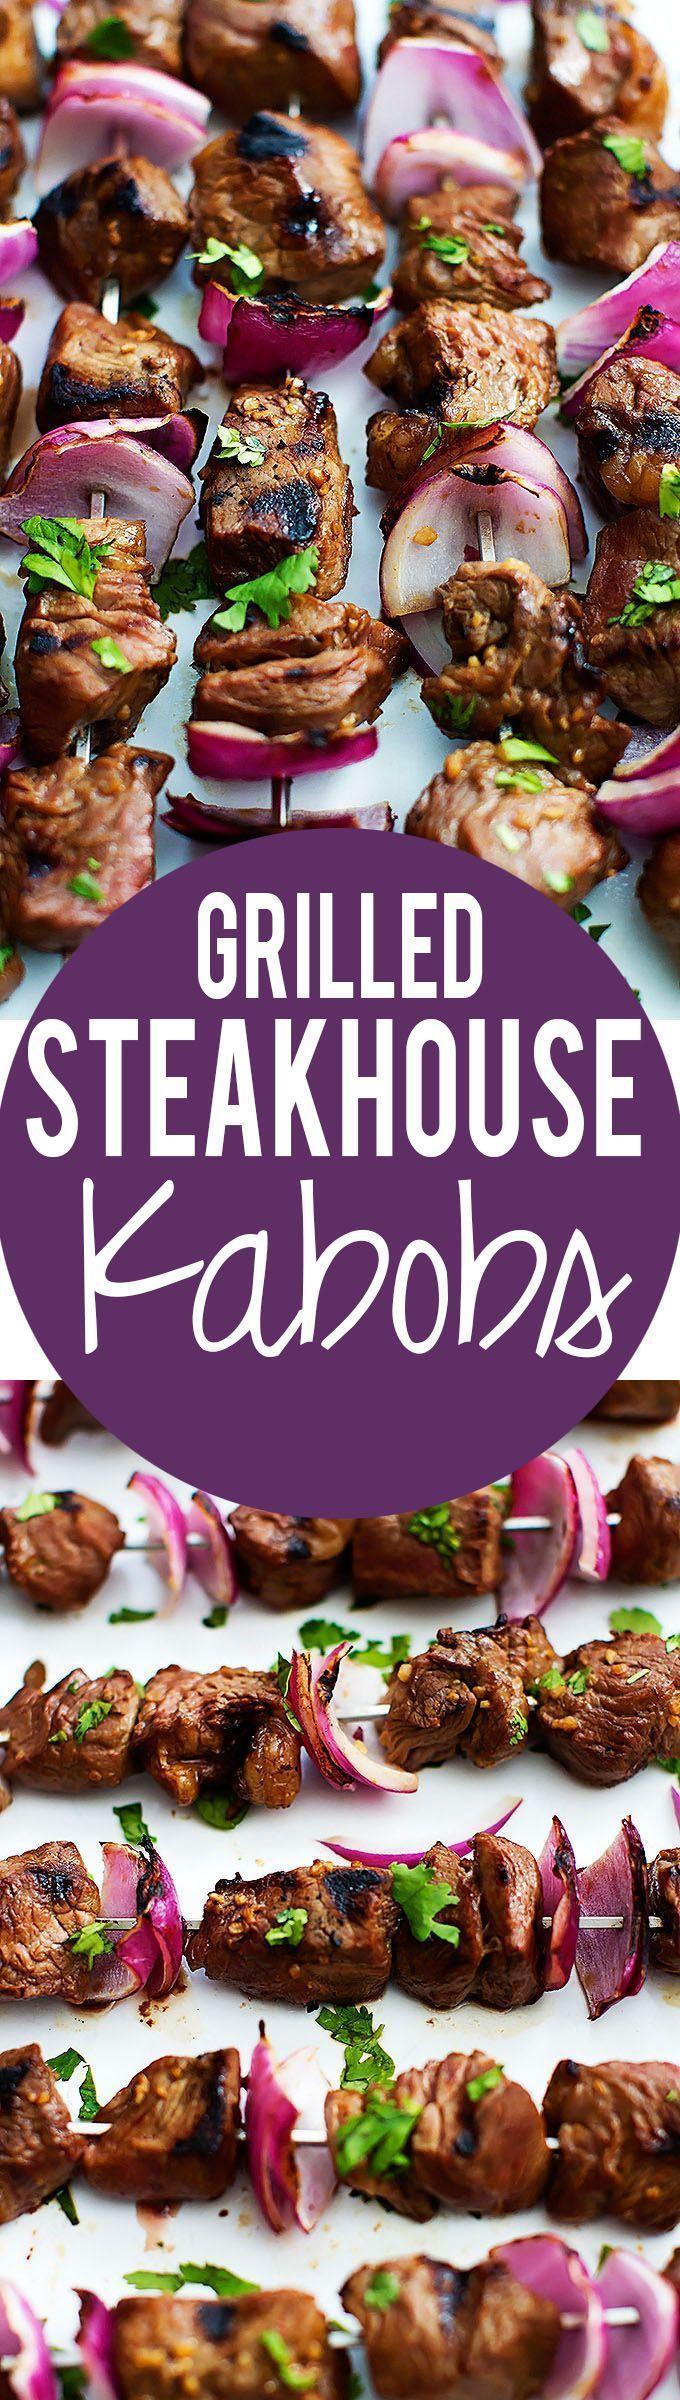 Grilled Steakhouse Kabobs | Creme de la Crumb